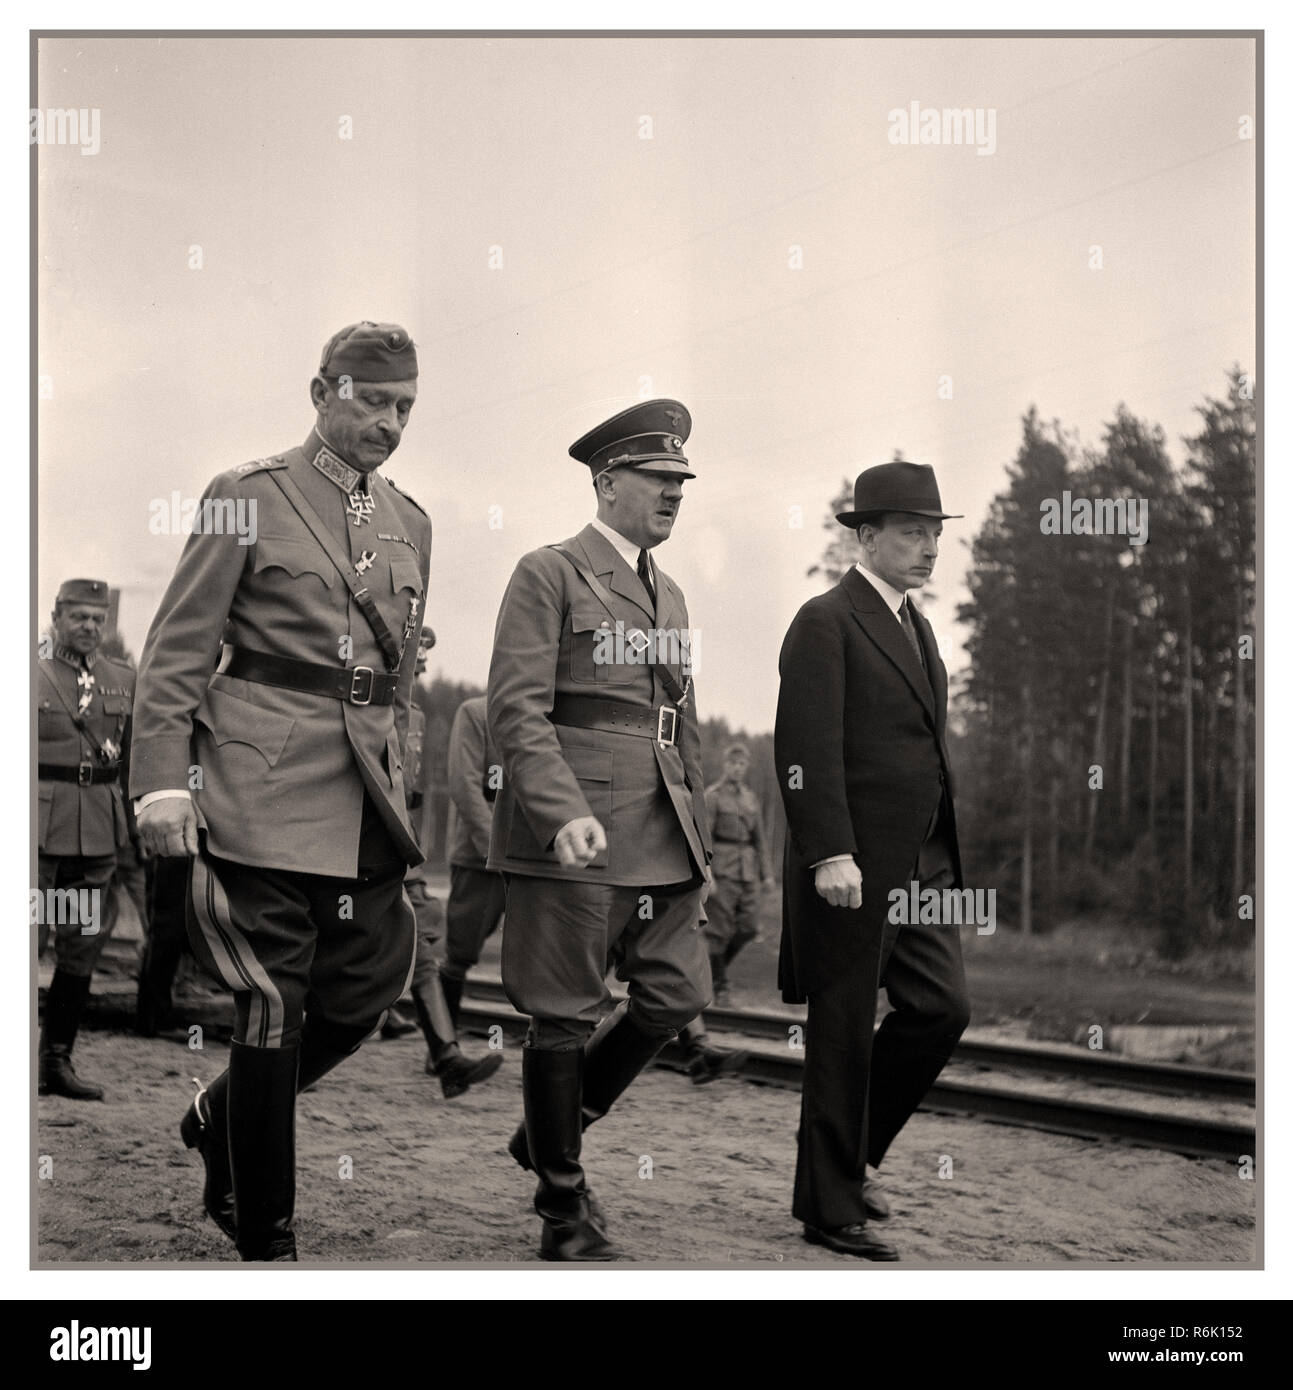 Field Marshall Mannerheim Adolf Hitler and Finnish President Ryti June 4th 1942 during Hitler's visit to Immola Finland - Stock Image